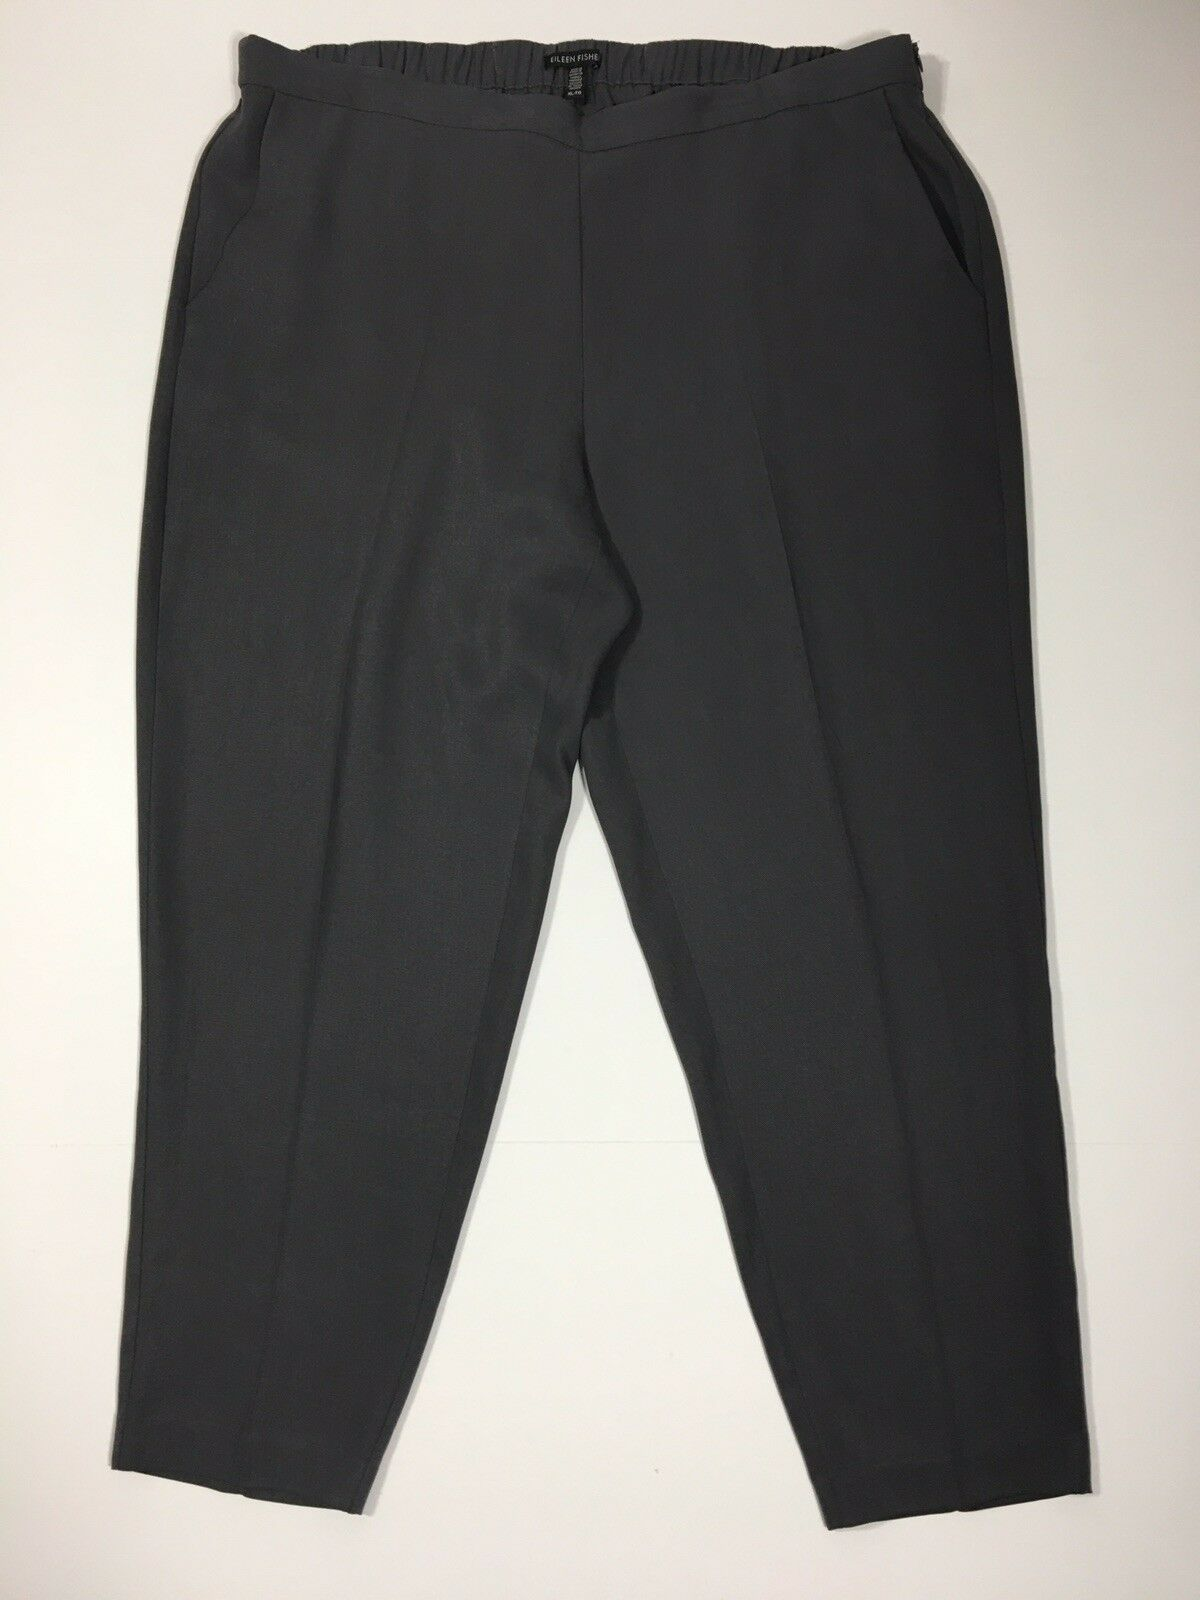 Eileen Fisher Tencel Größe élastique souple cheville Pantalon Größe XL